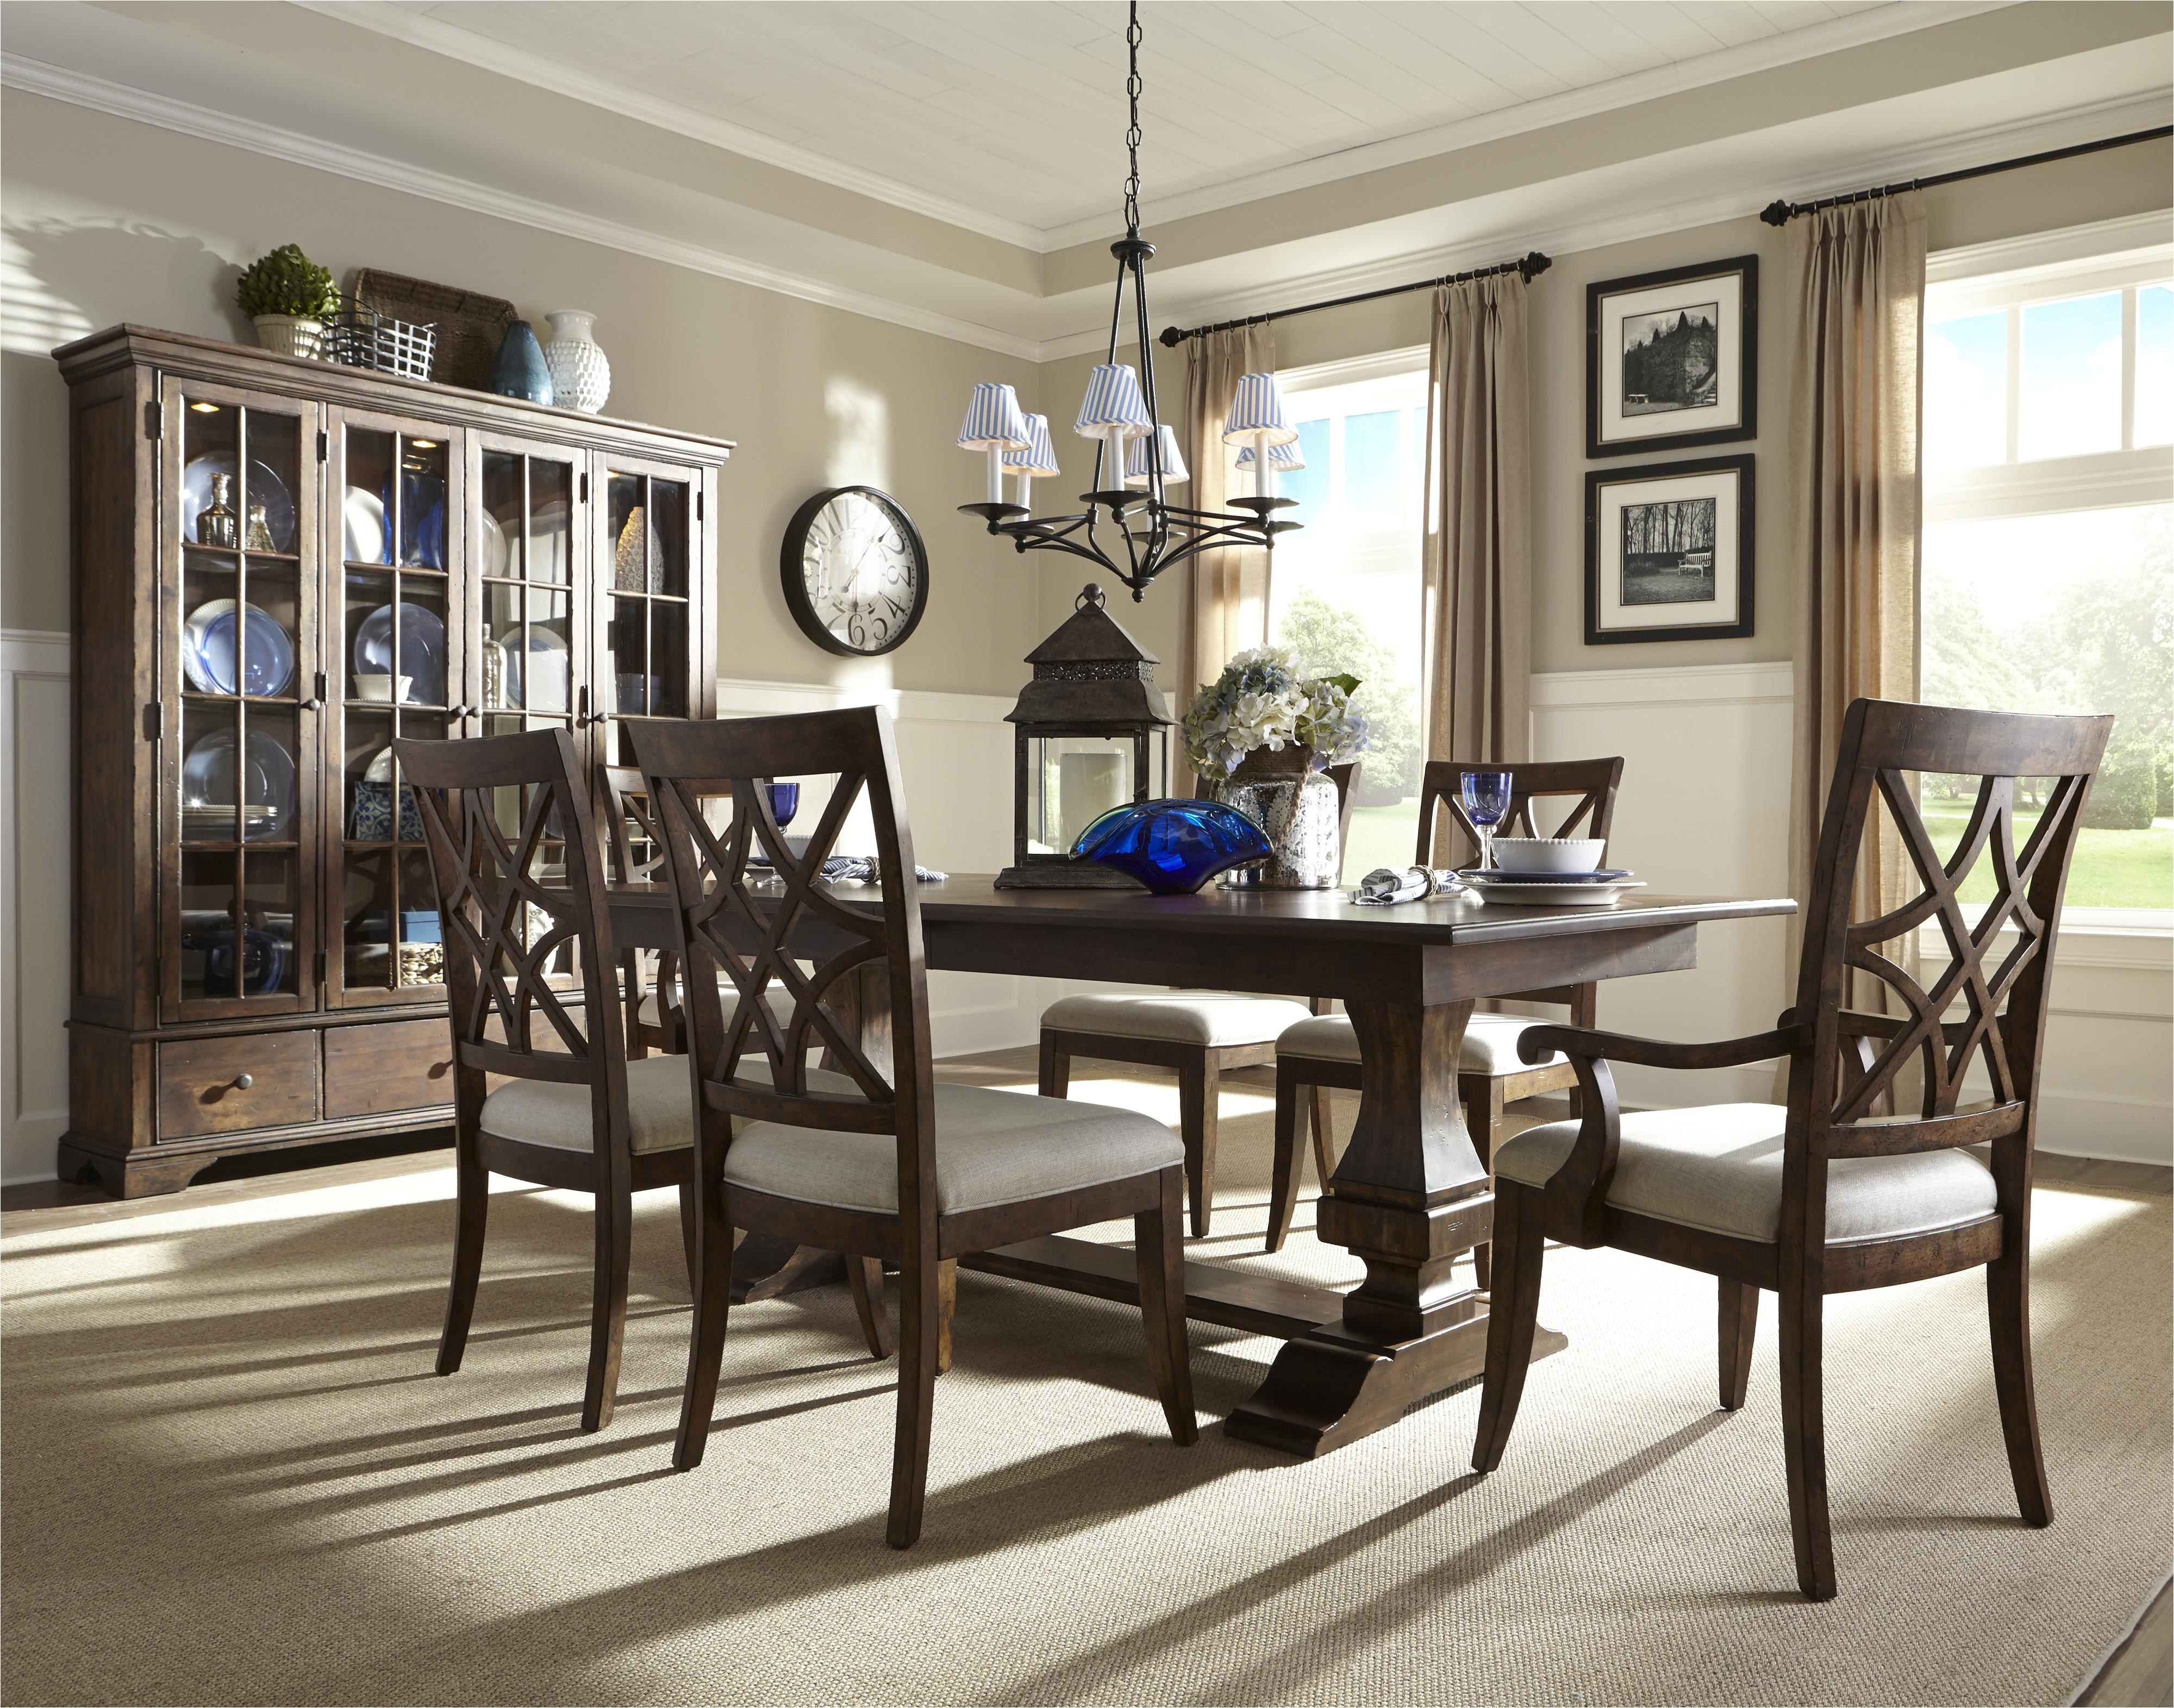 Aamerica Furniture Wicker Outdoor sofa 0d Patio Chairs Sale